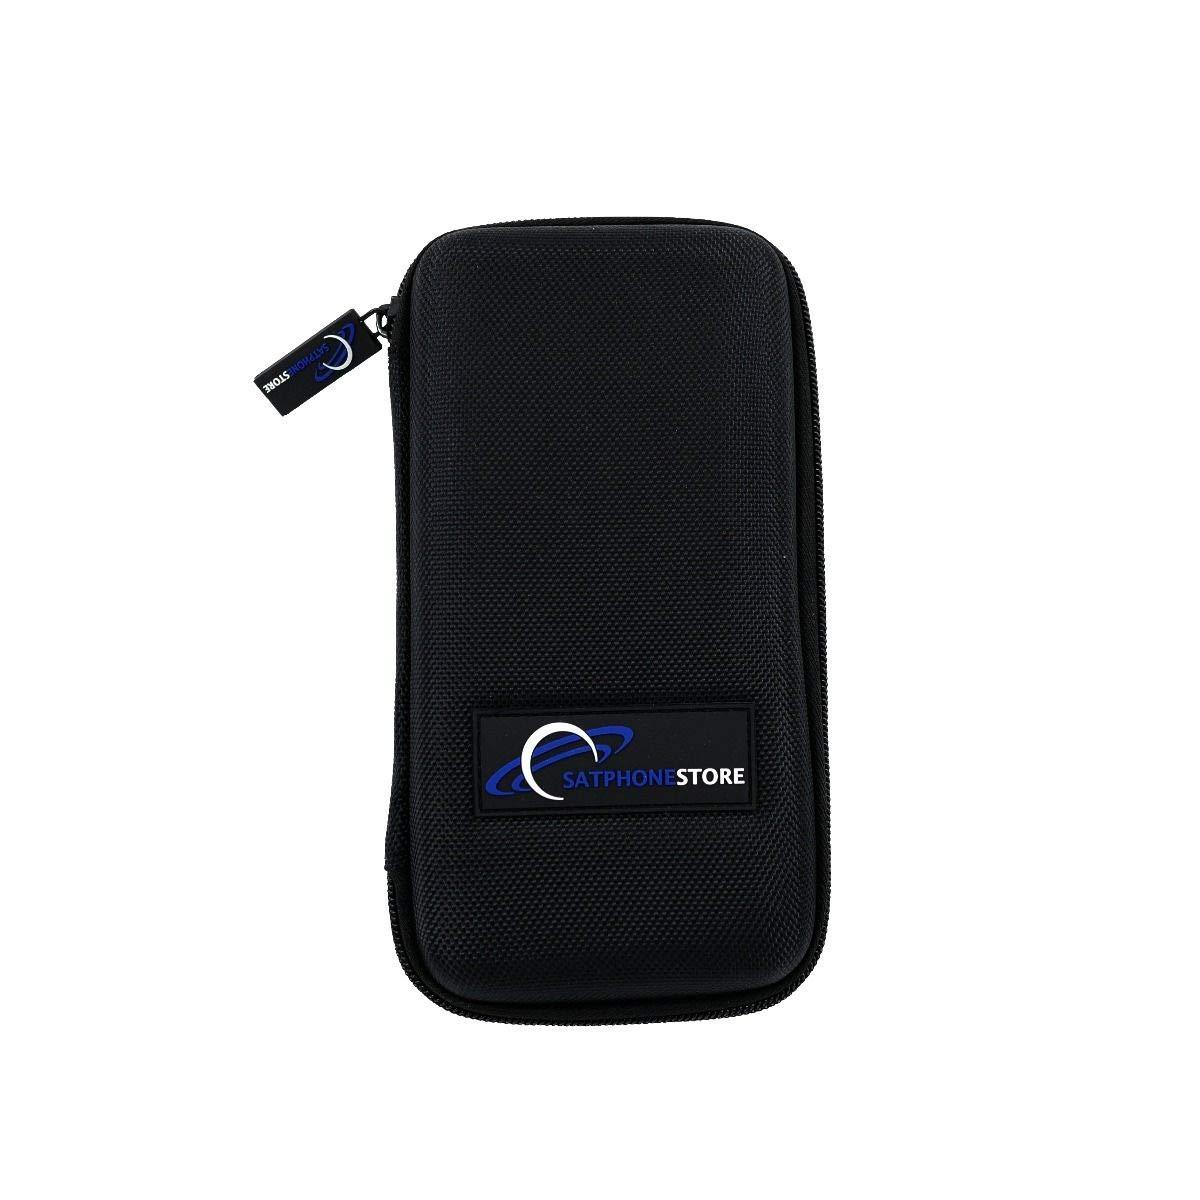 SatPhoneStore Tough Case for Garmin InReach, Delorme InReach, Globlastar Spot X by SatPhoneStore